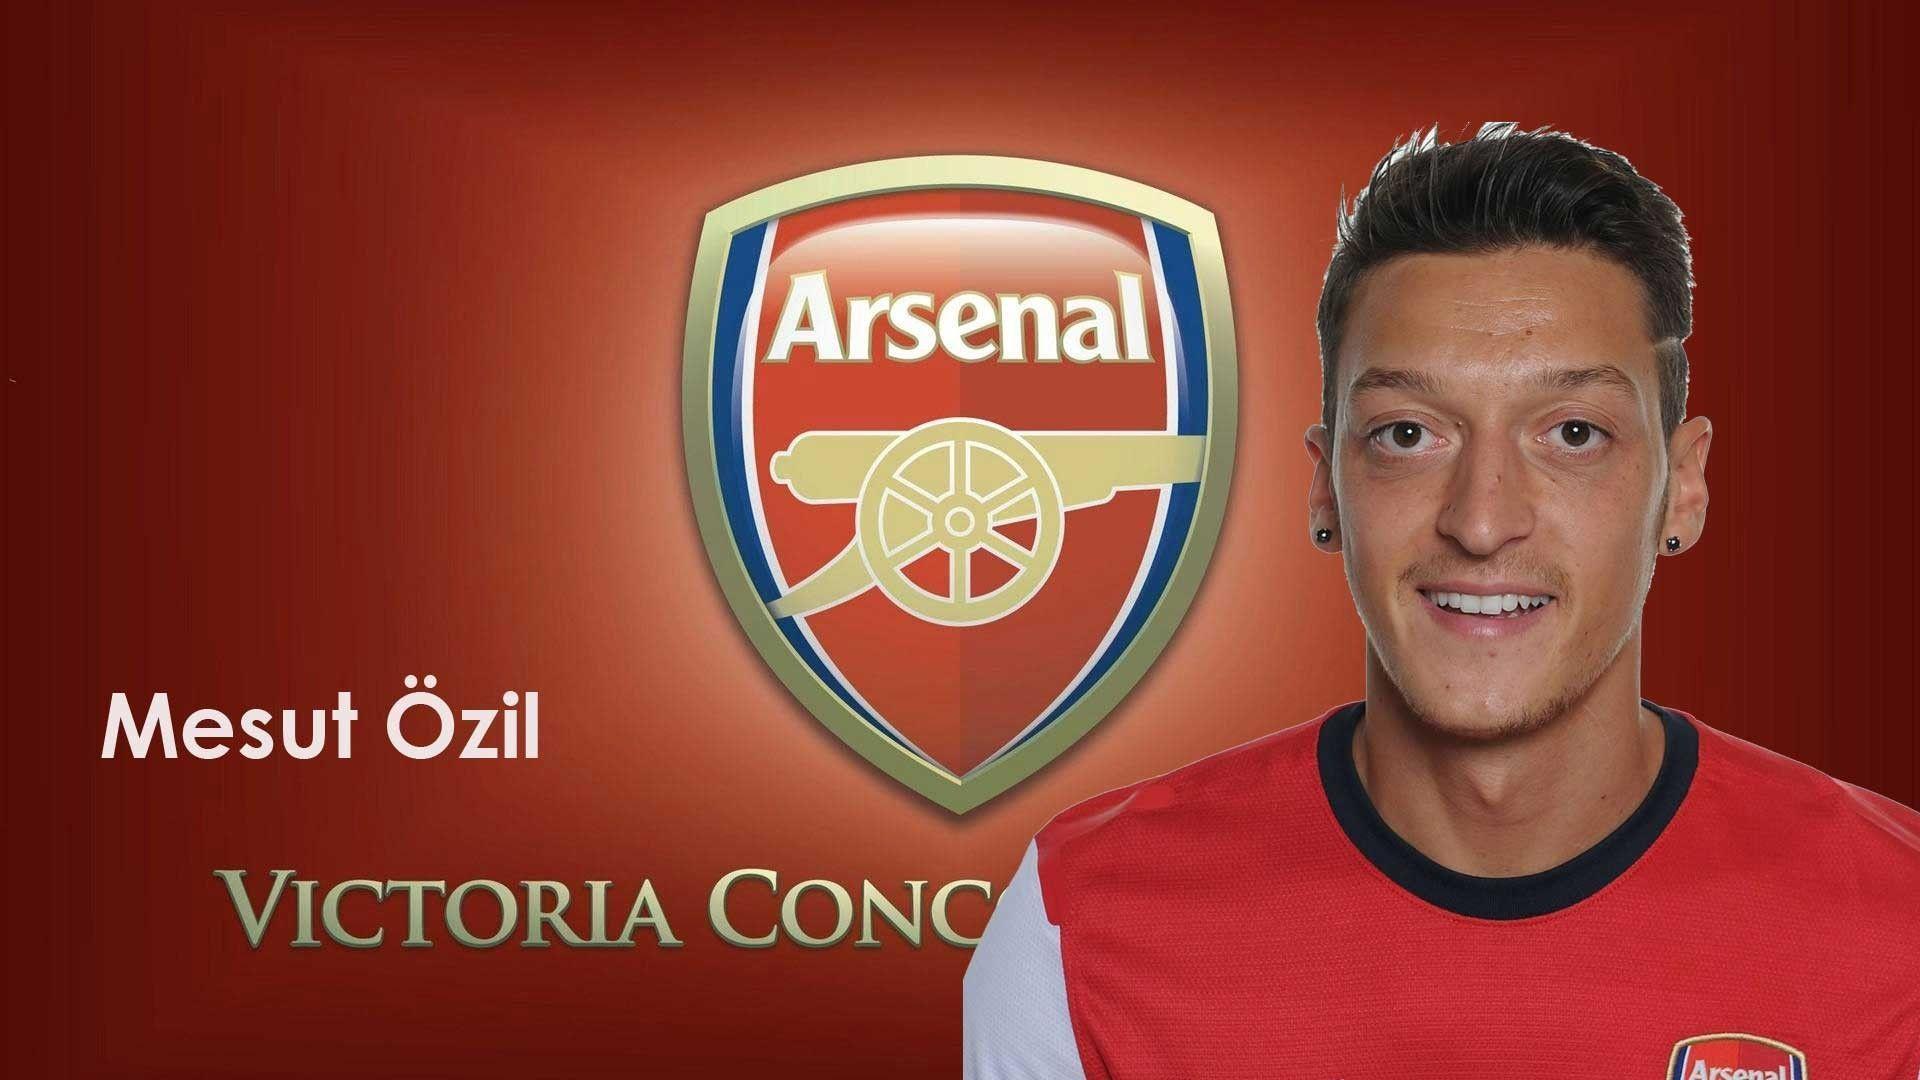 Mesut Ozil Wallpapers Hd Arsenal Mesut Ozil Wallpapers Wallpaper Cave